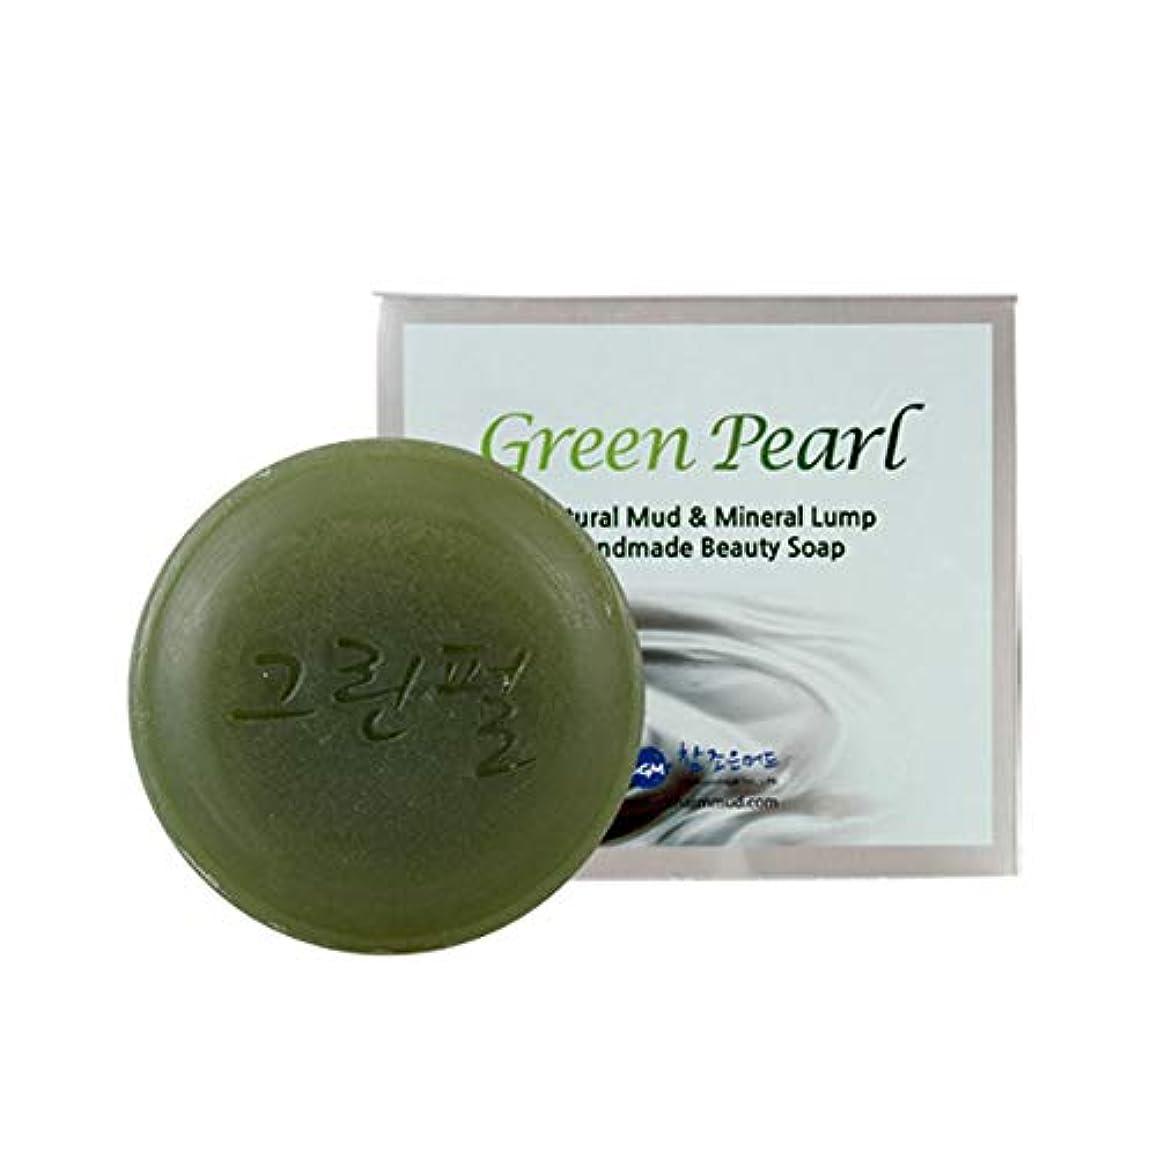 [Charmmud] グリーンパール せっけん スキンケア ミネラル 手作り美容 石鹸 [並行輸入品]